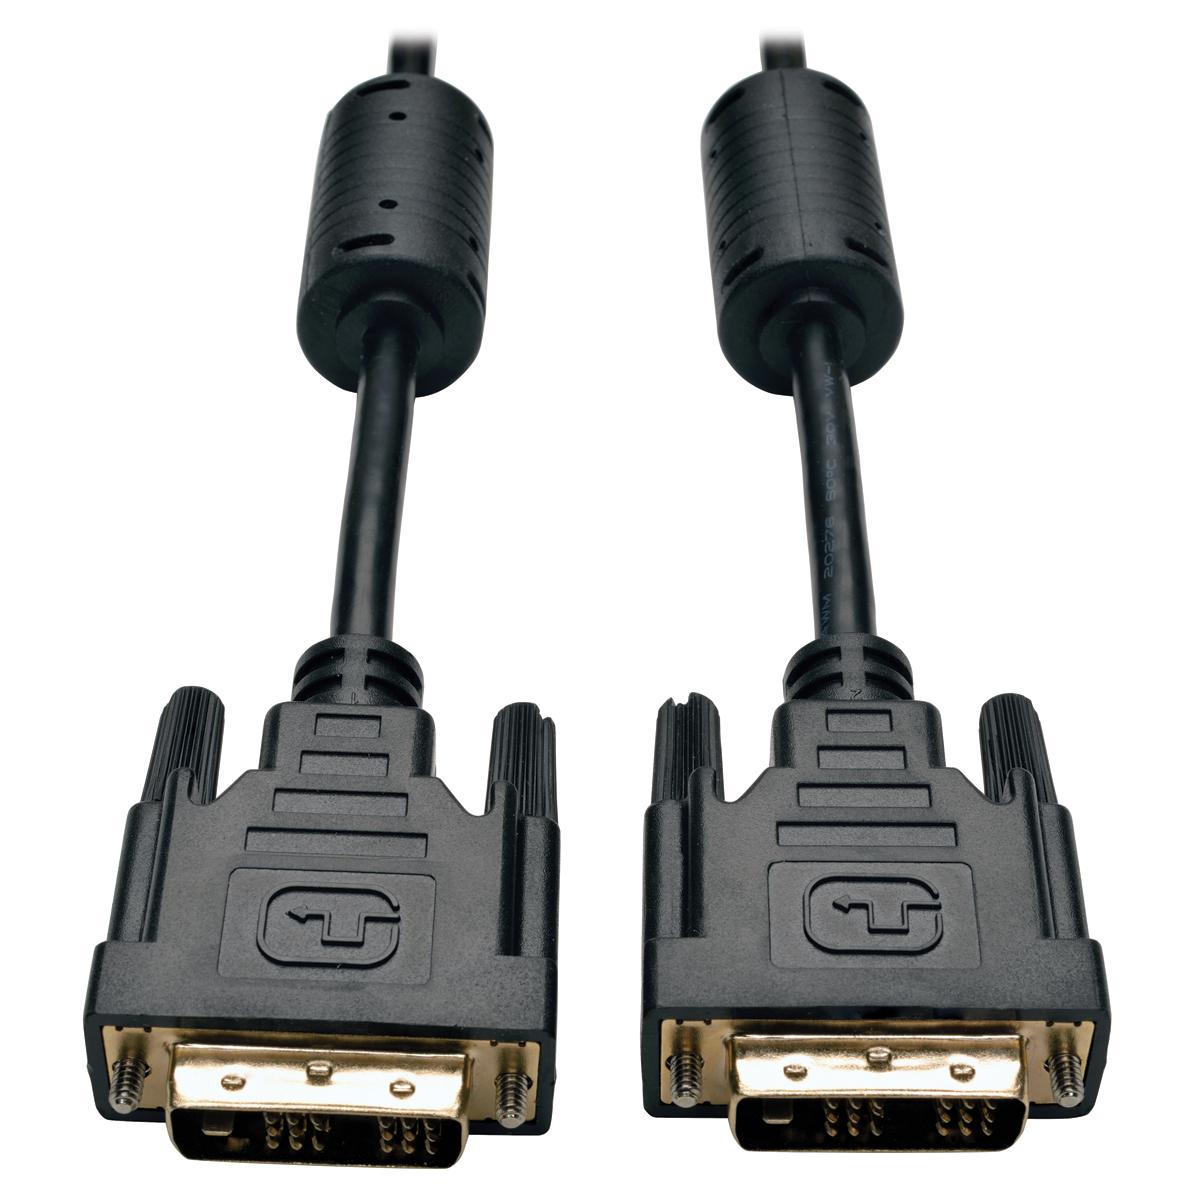 Tripp Lite DVI Single Link Cable, Digital TMDS Monitor Cable (DVI-D M/M), 1.83 m (6-ft.)